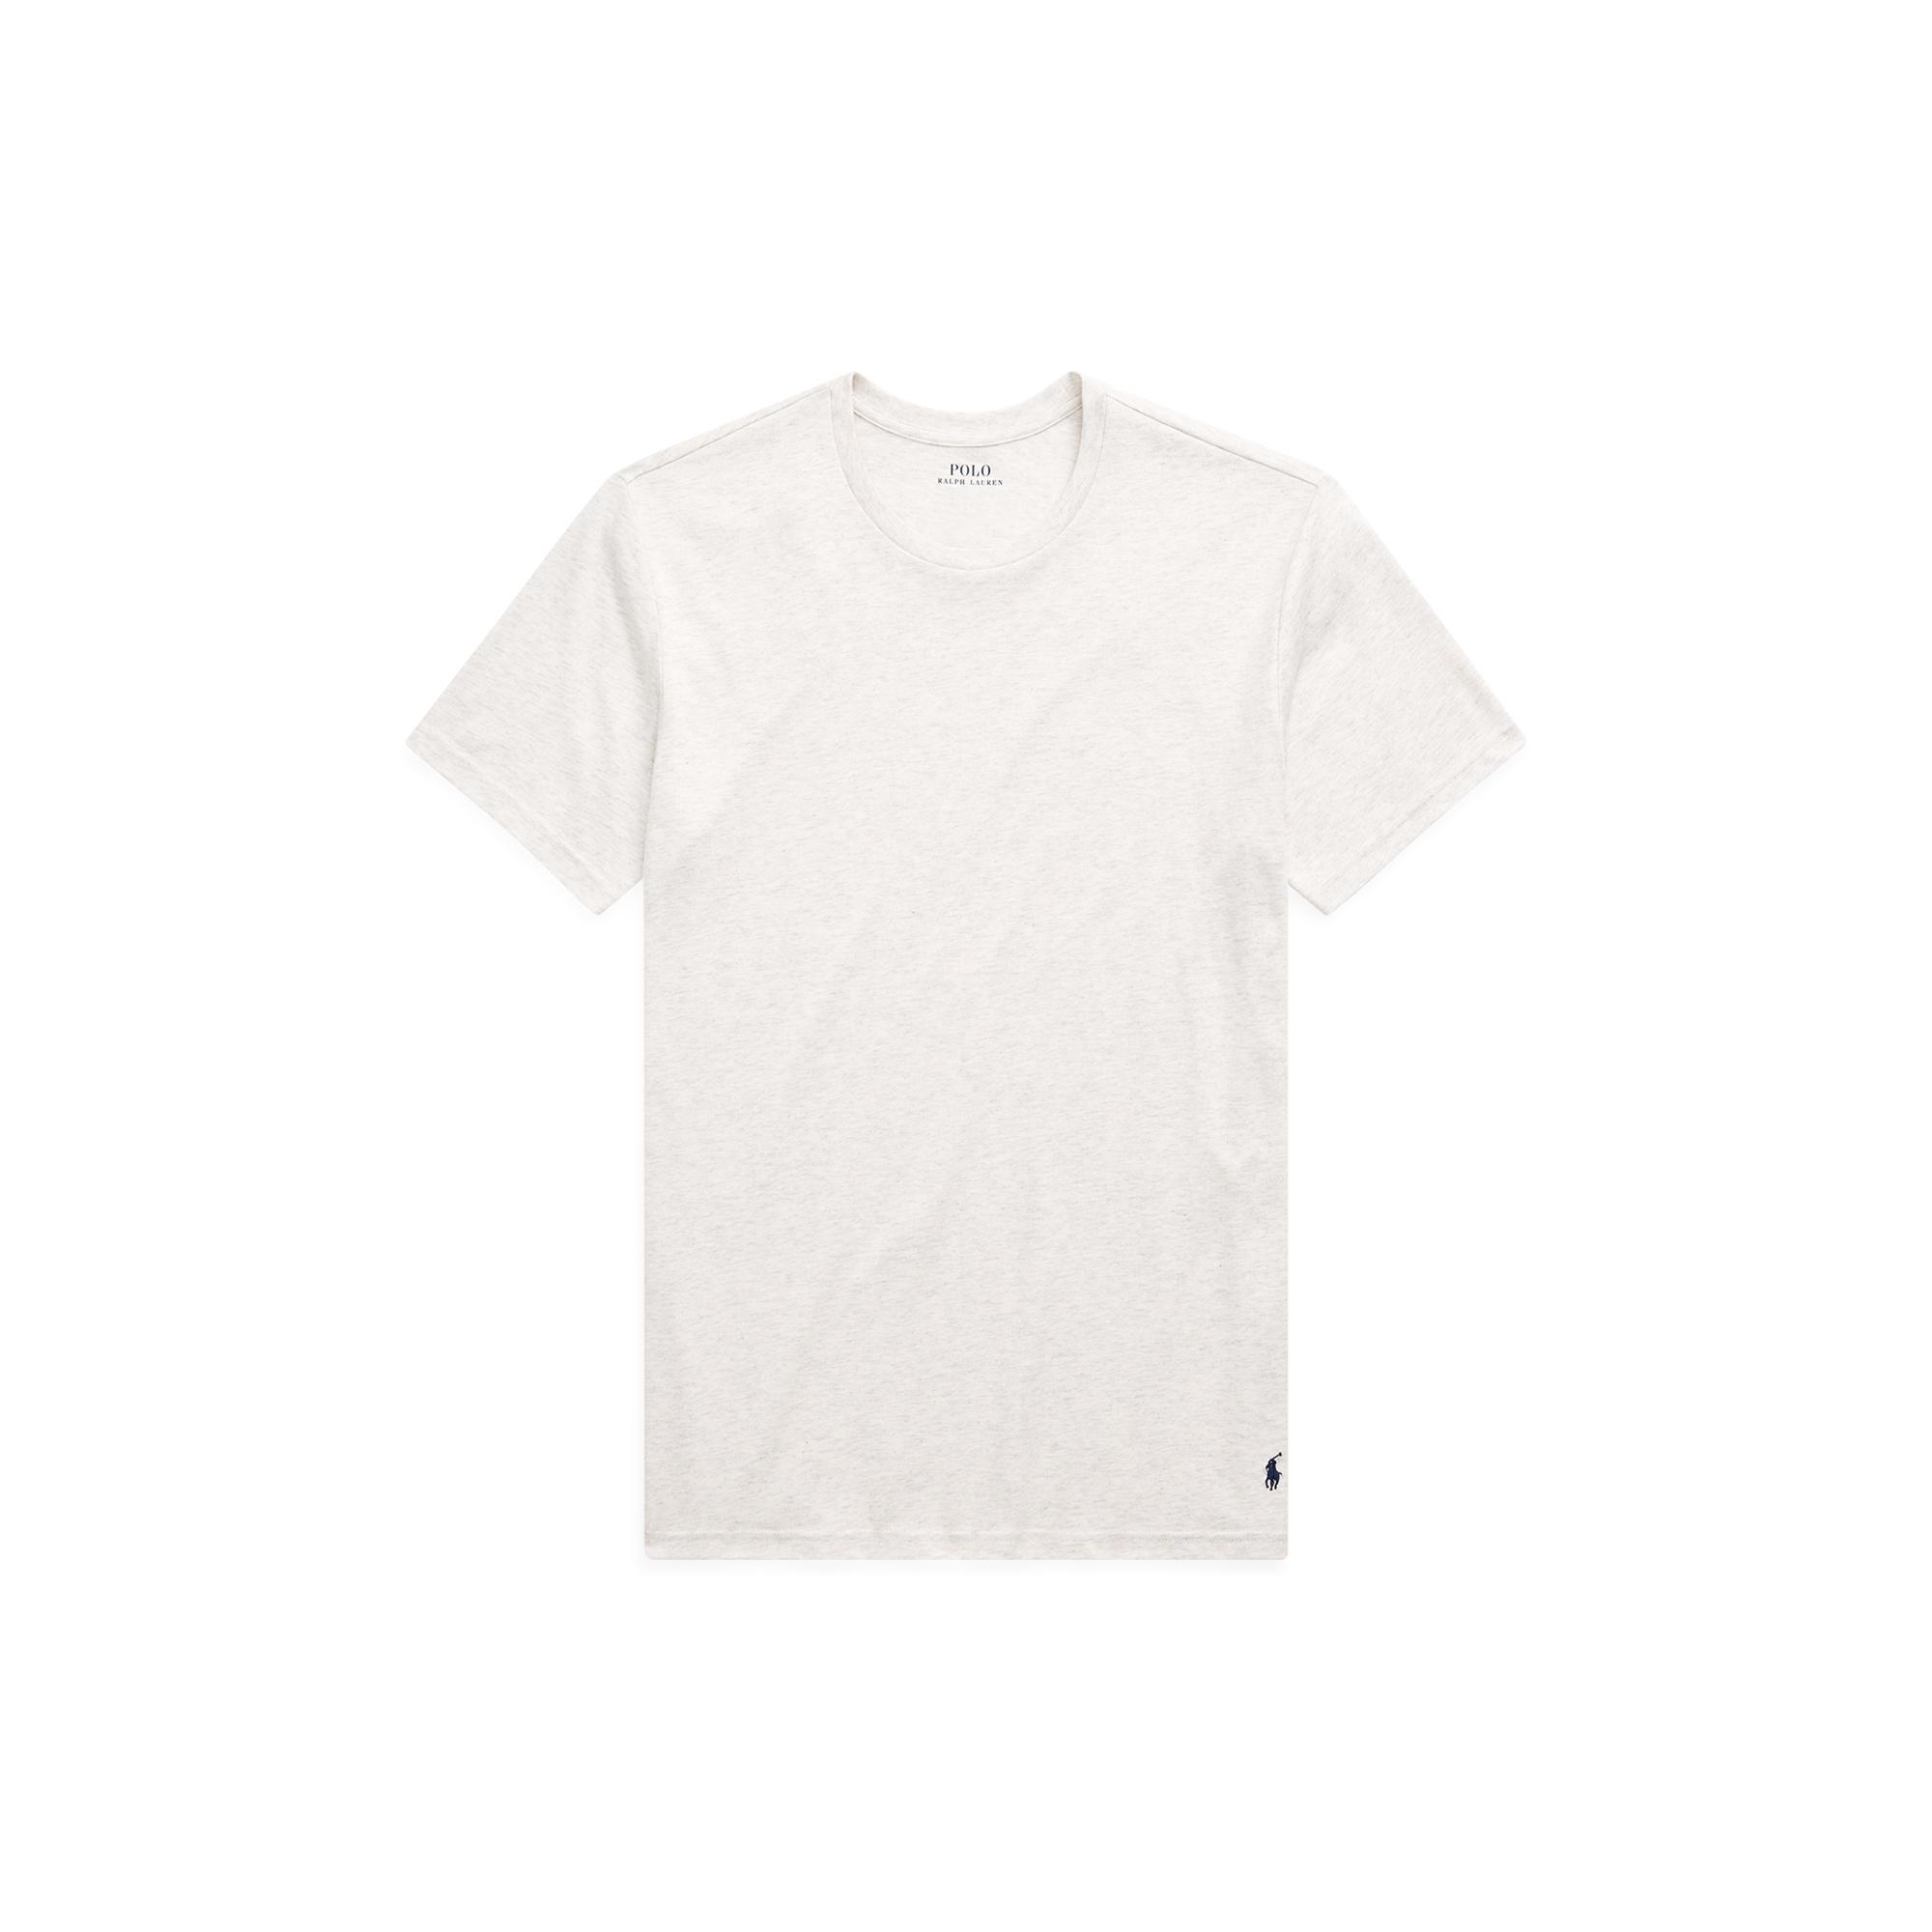 eb8d45d7e2 Lyst - Polo Ralph Lauren Supreme Comfort Crewneck Tee in White for Men